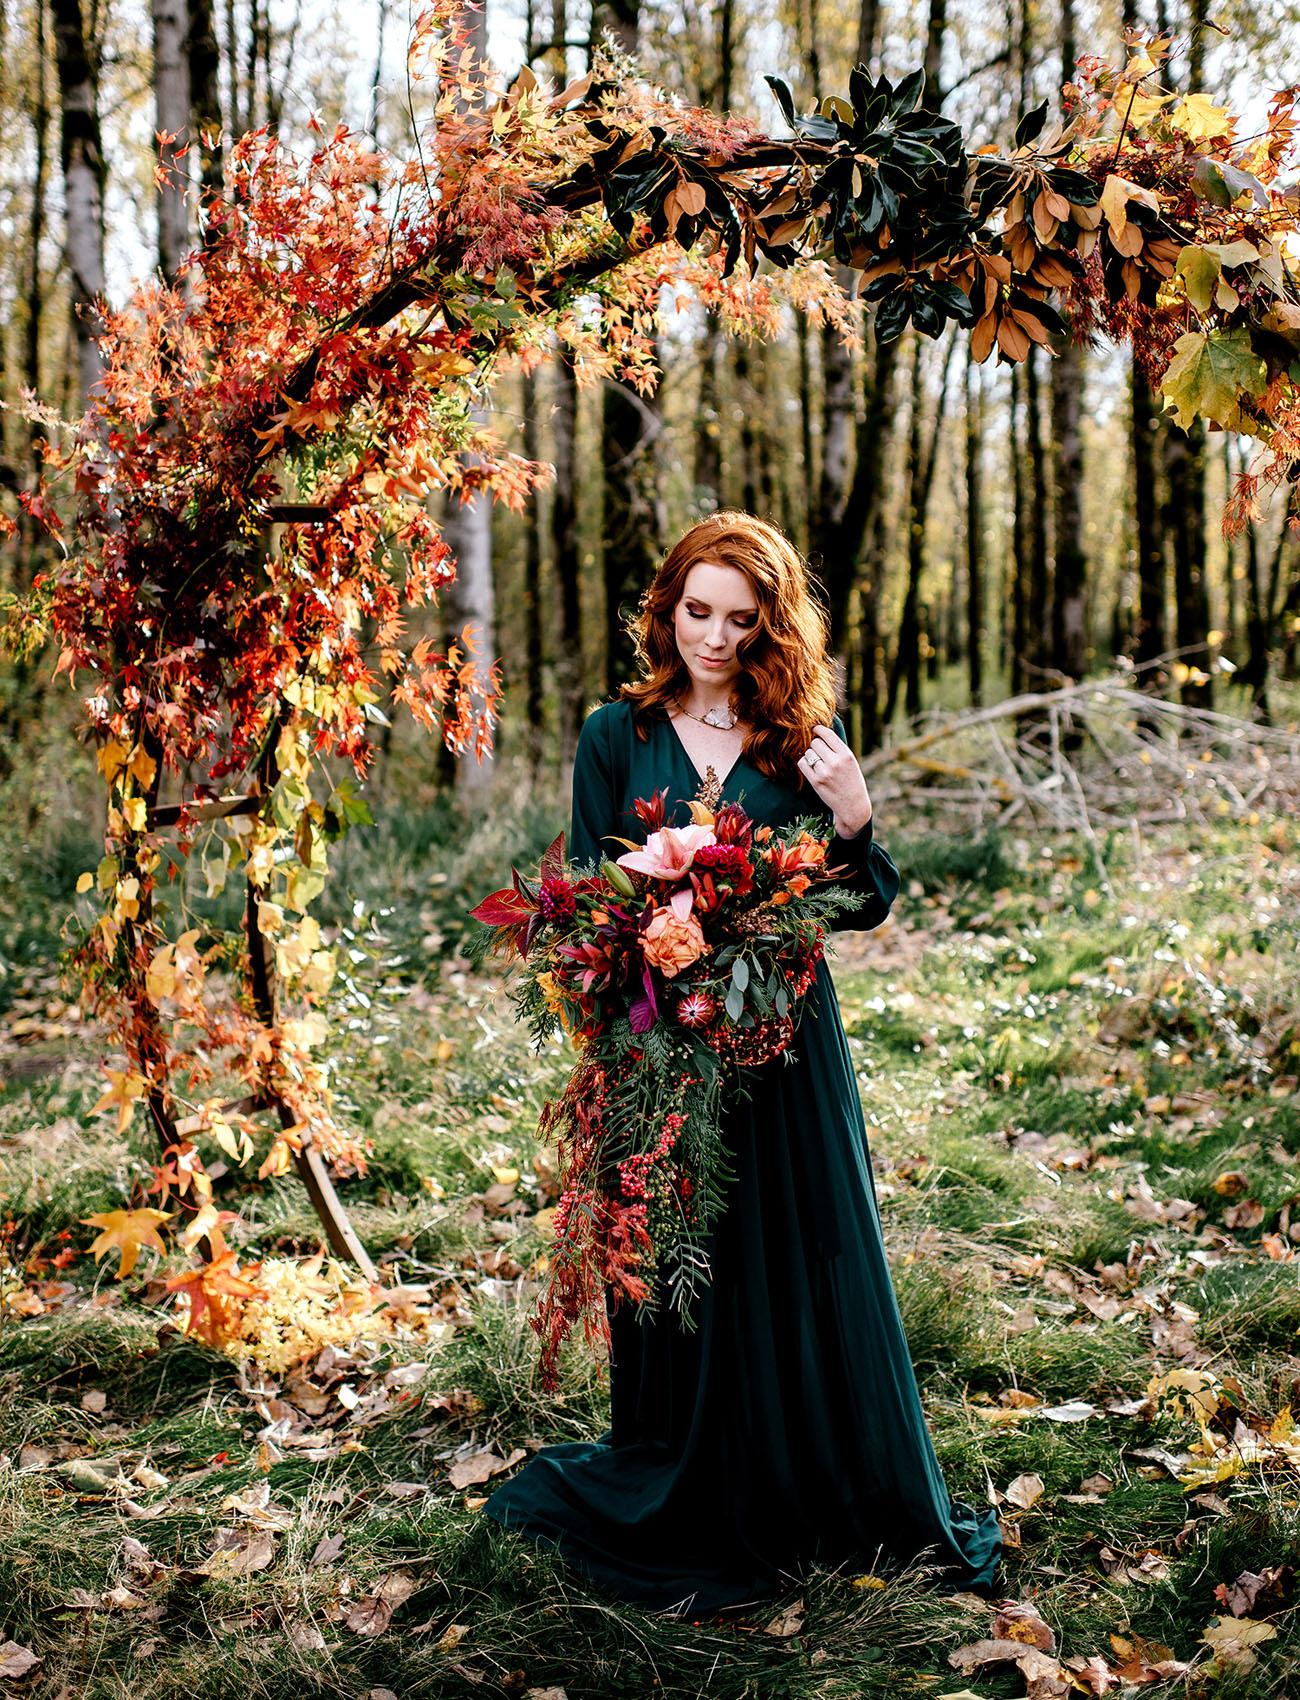 Herfstbruiloft bruid met bruidsboeket